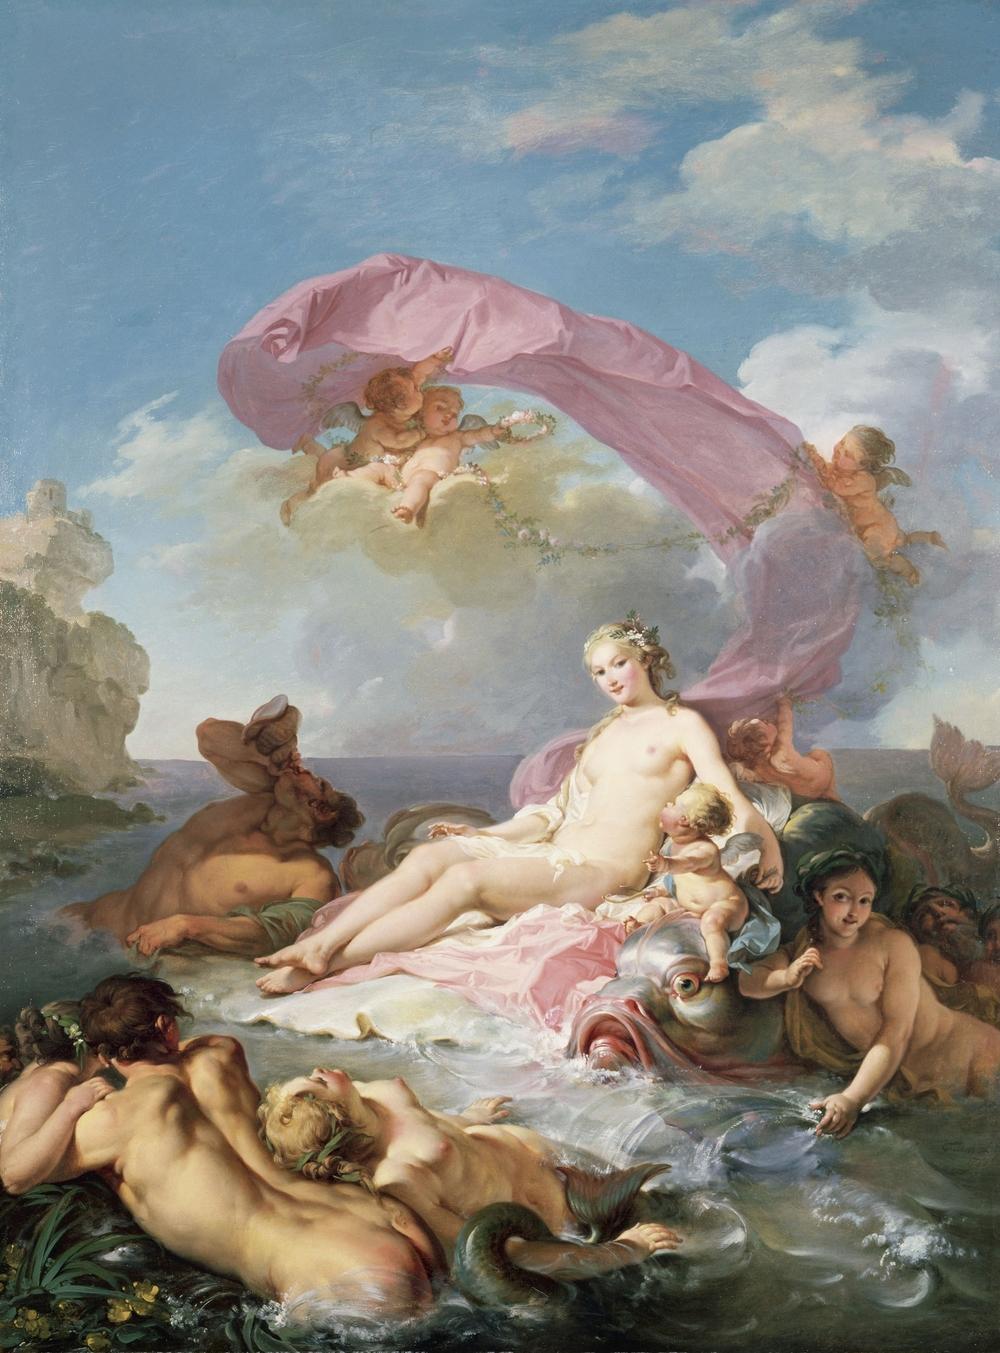 Hughes_Taraval_-_The_Triumph_of_Amphitrite,_1780.jpg